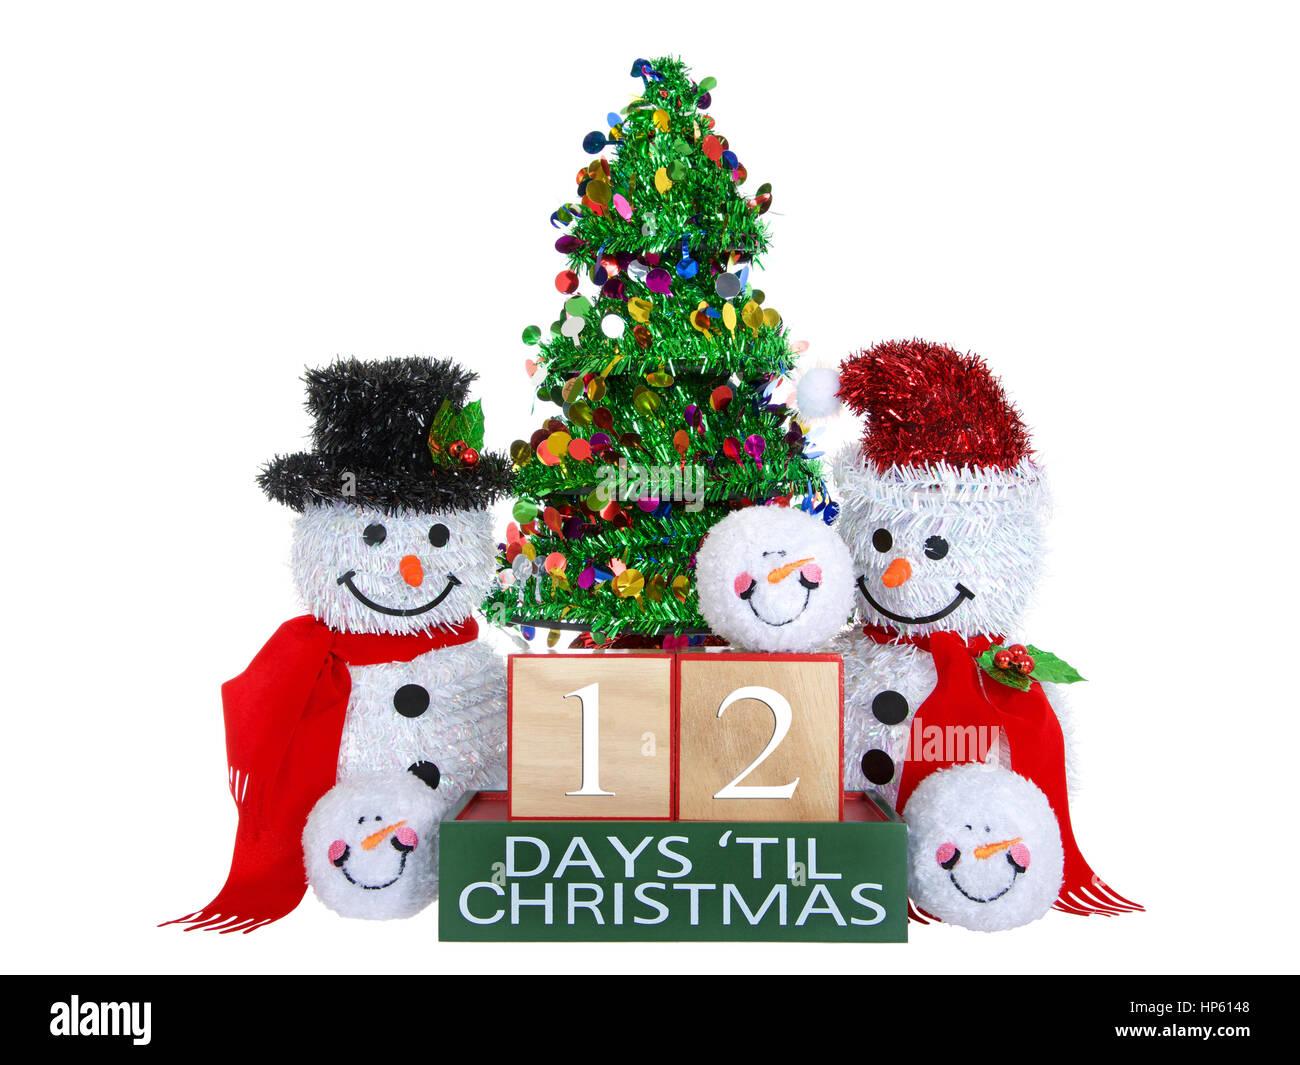 12 Days Before Christmas.12 Days Of Christmas Stock Photos 12 Days Of Christmas